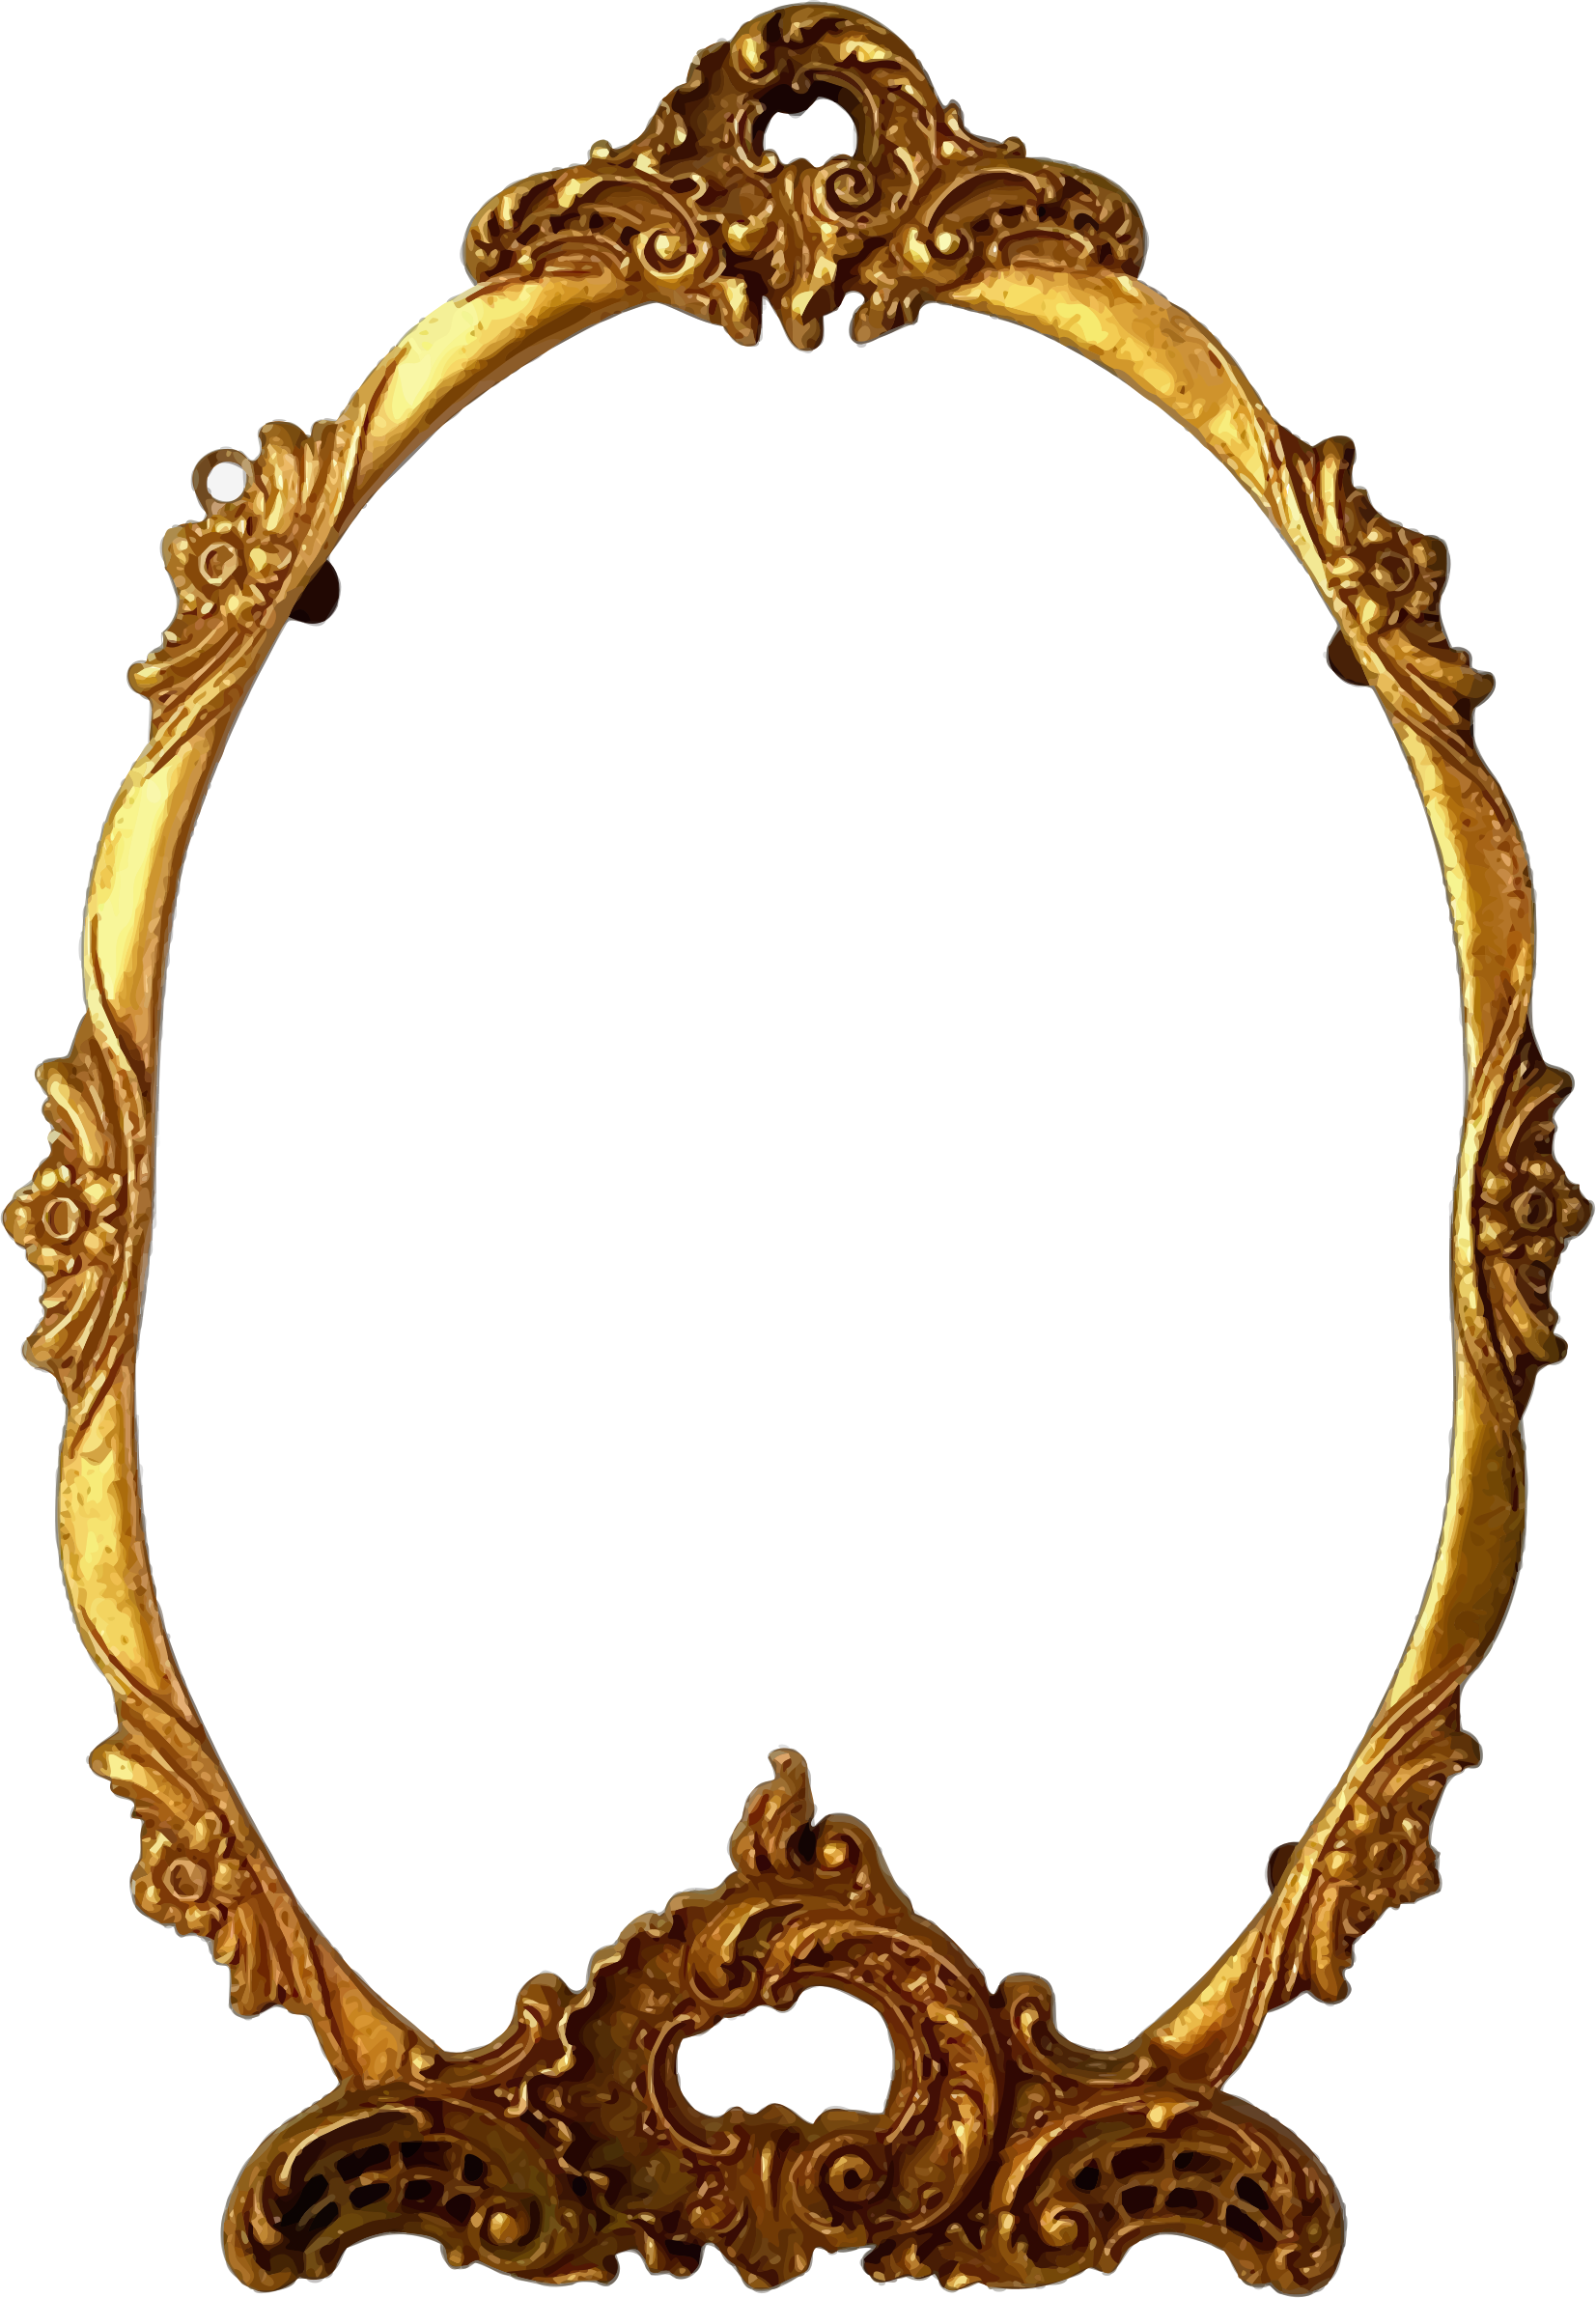 Frame big image png. Mirror clipart ornate